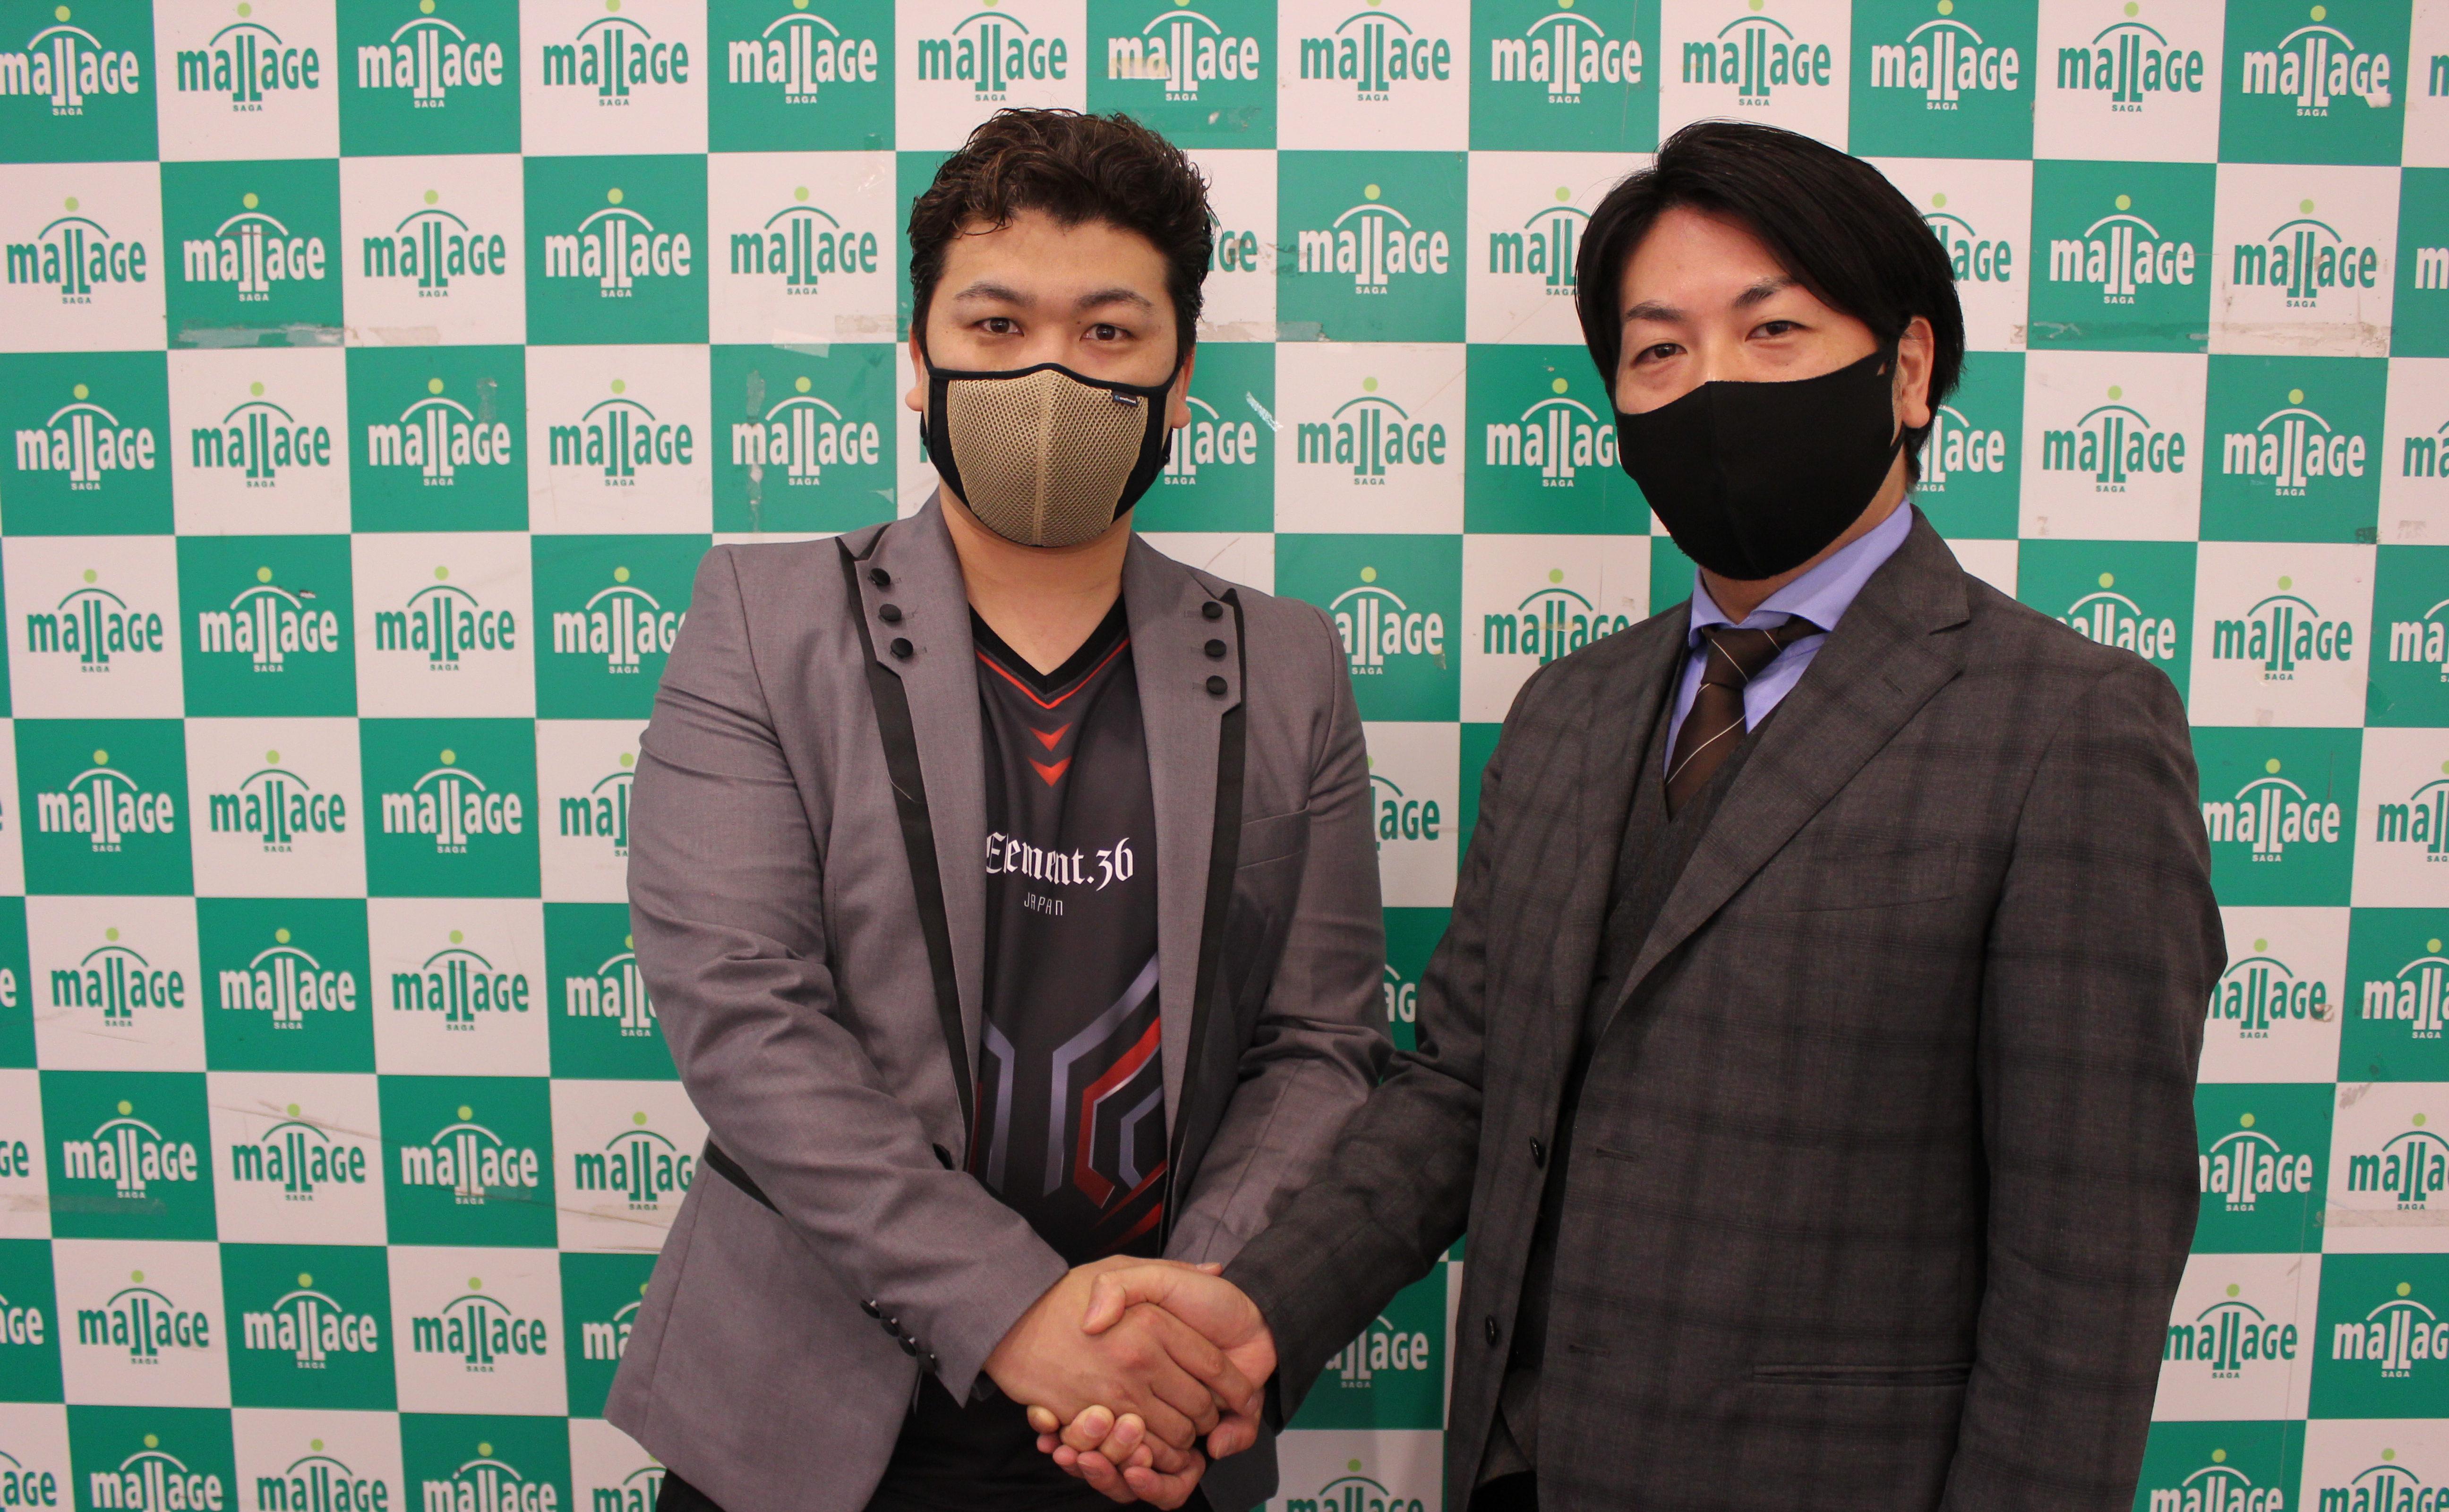 【ENTER FORCE.36】双日商業開発株式会社モラージュ佐賀とスポンサー契約締結